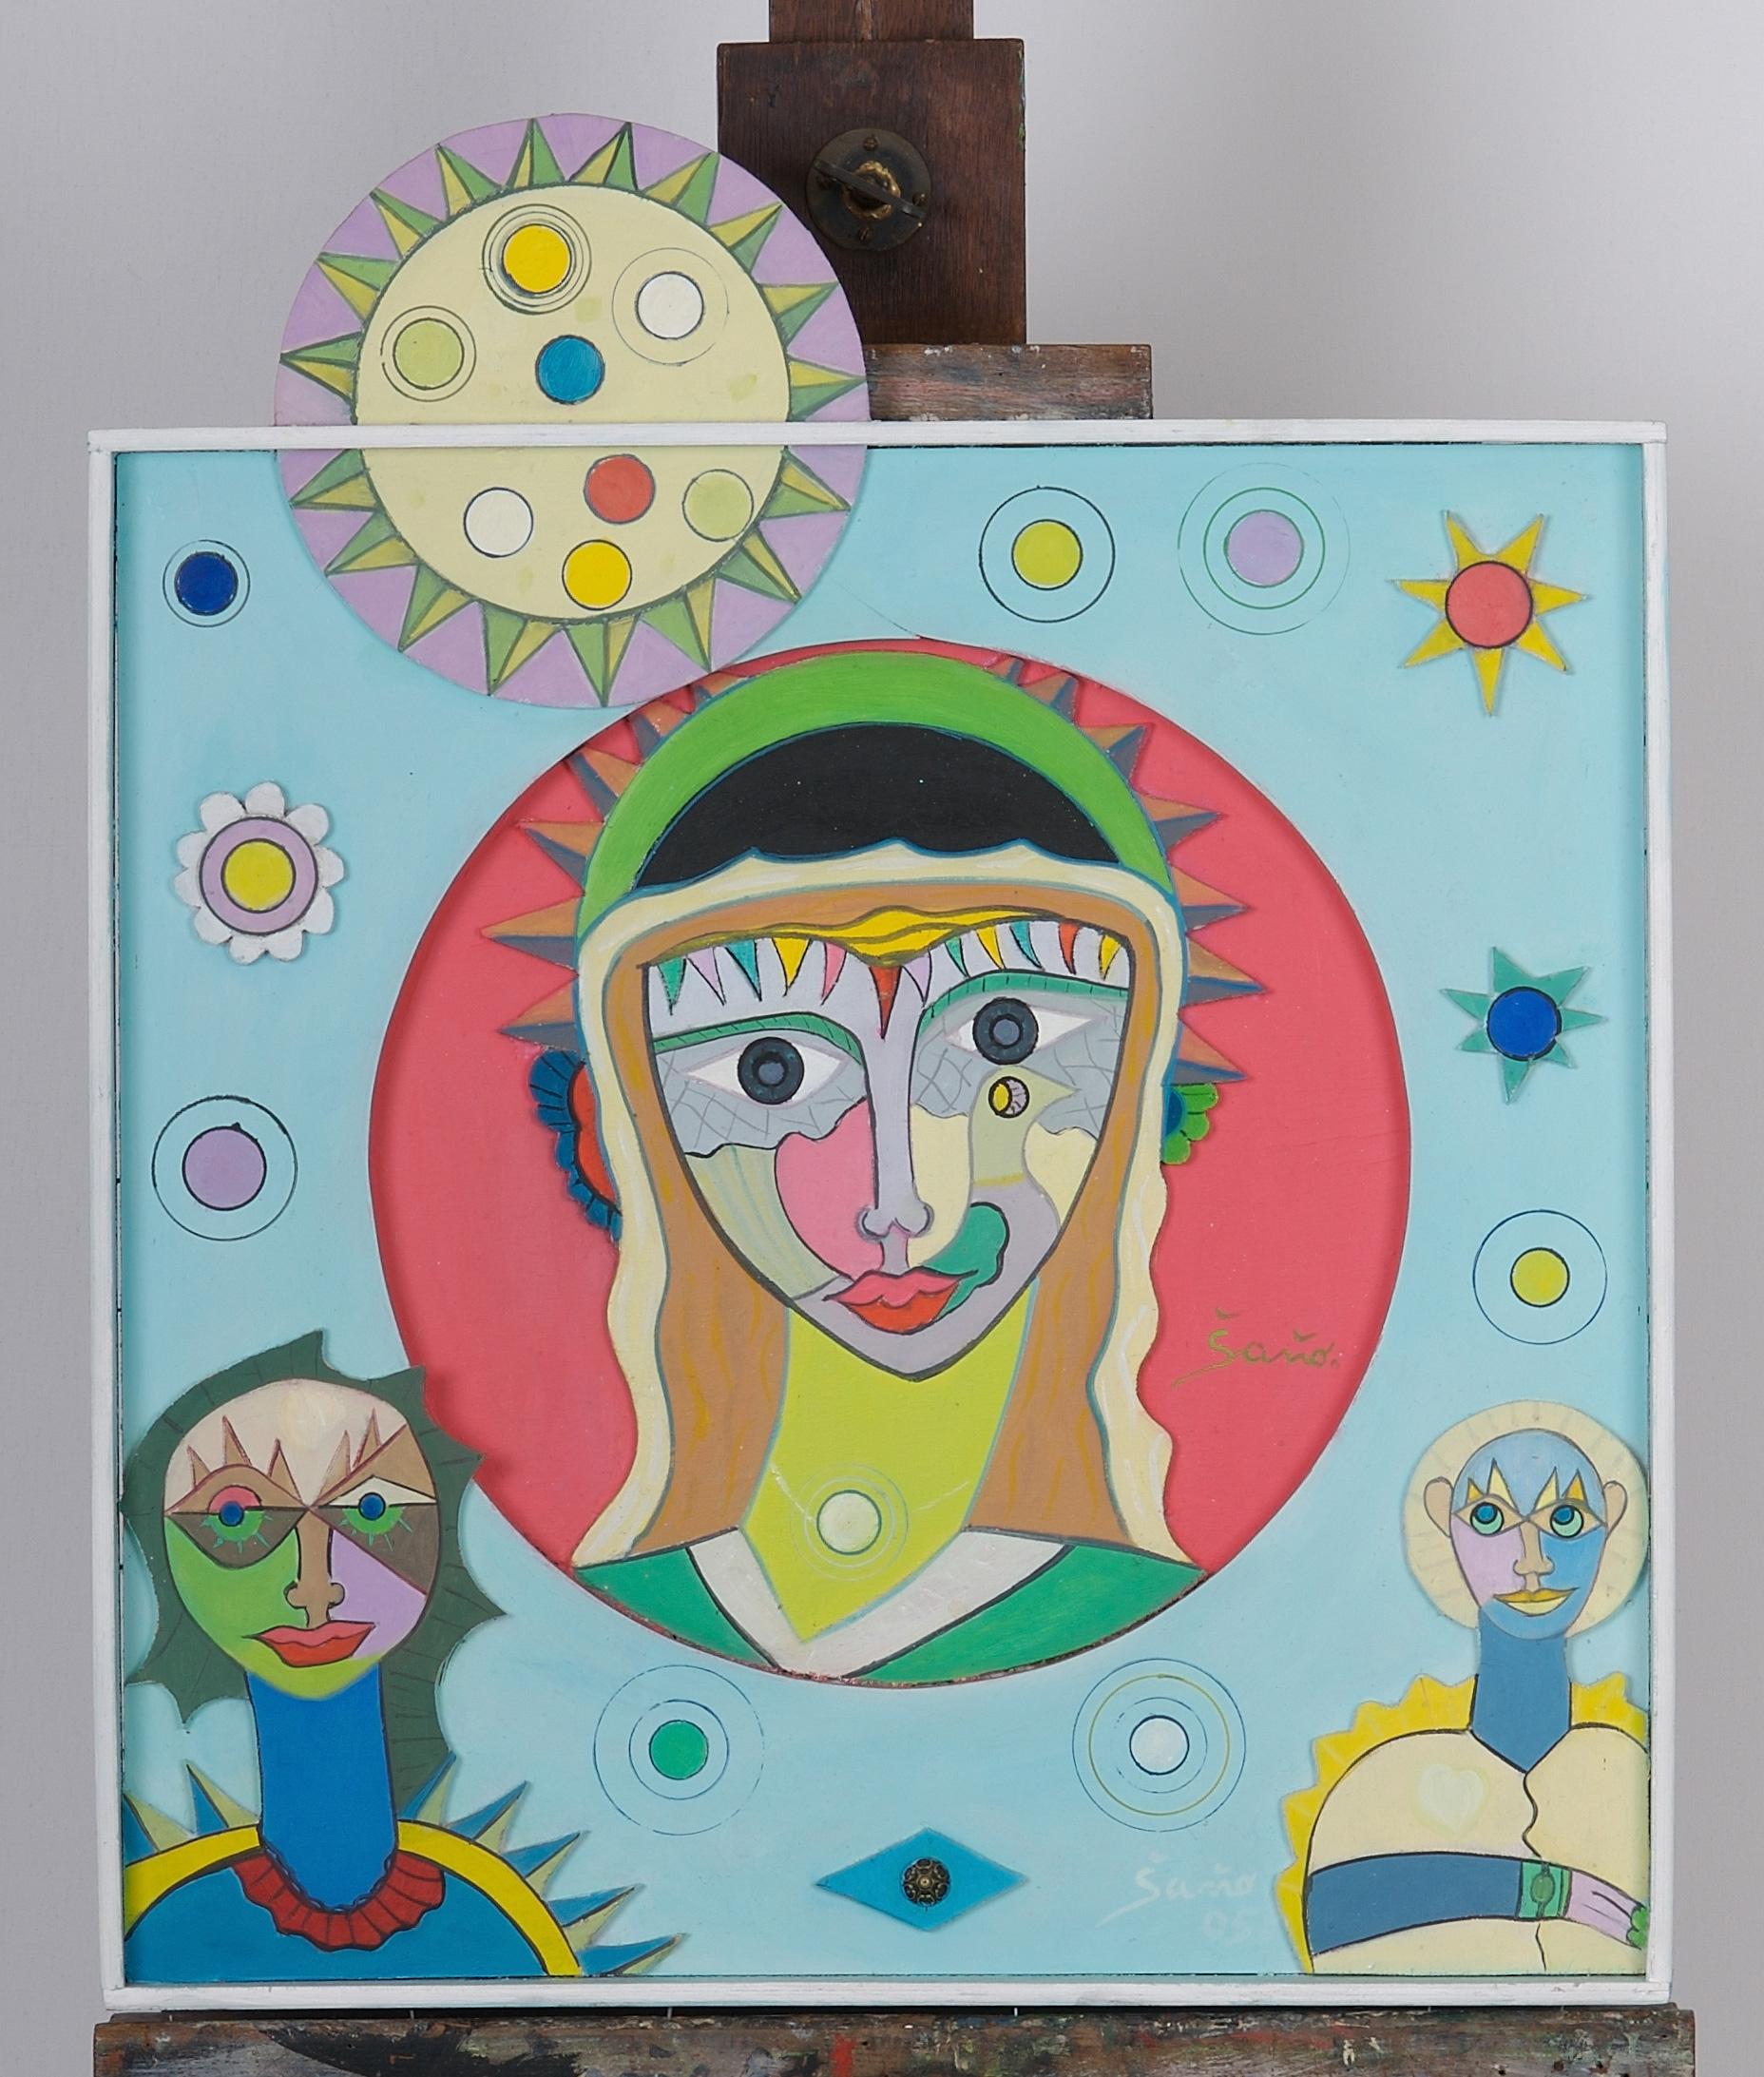 Portrait-de-Lise-sano-ludovit-daniel-artiste